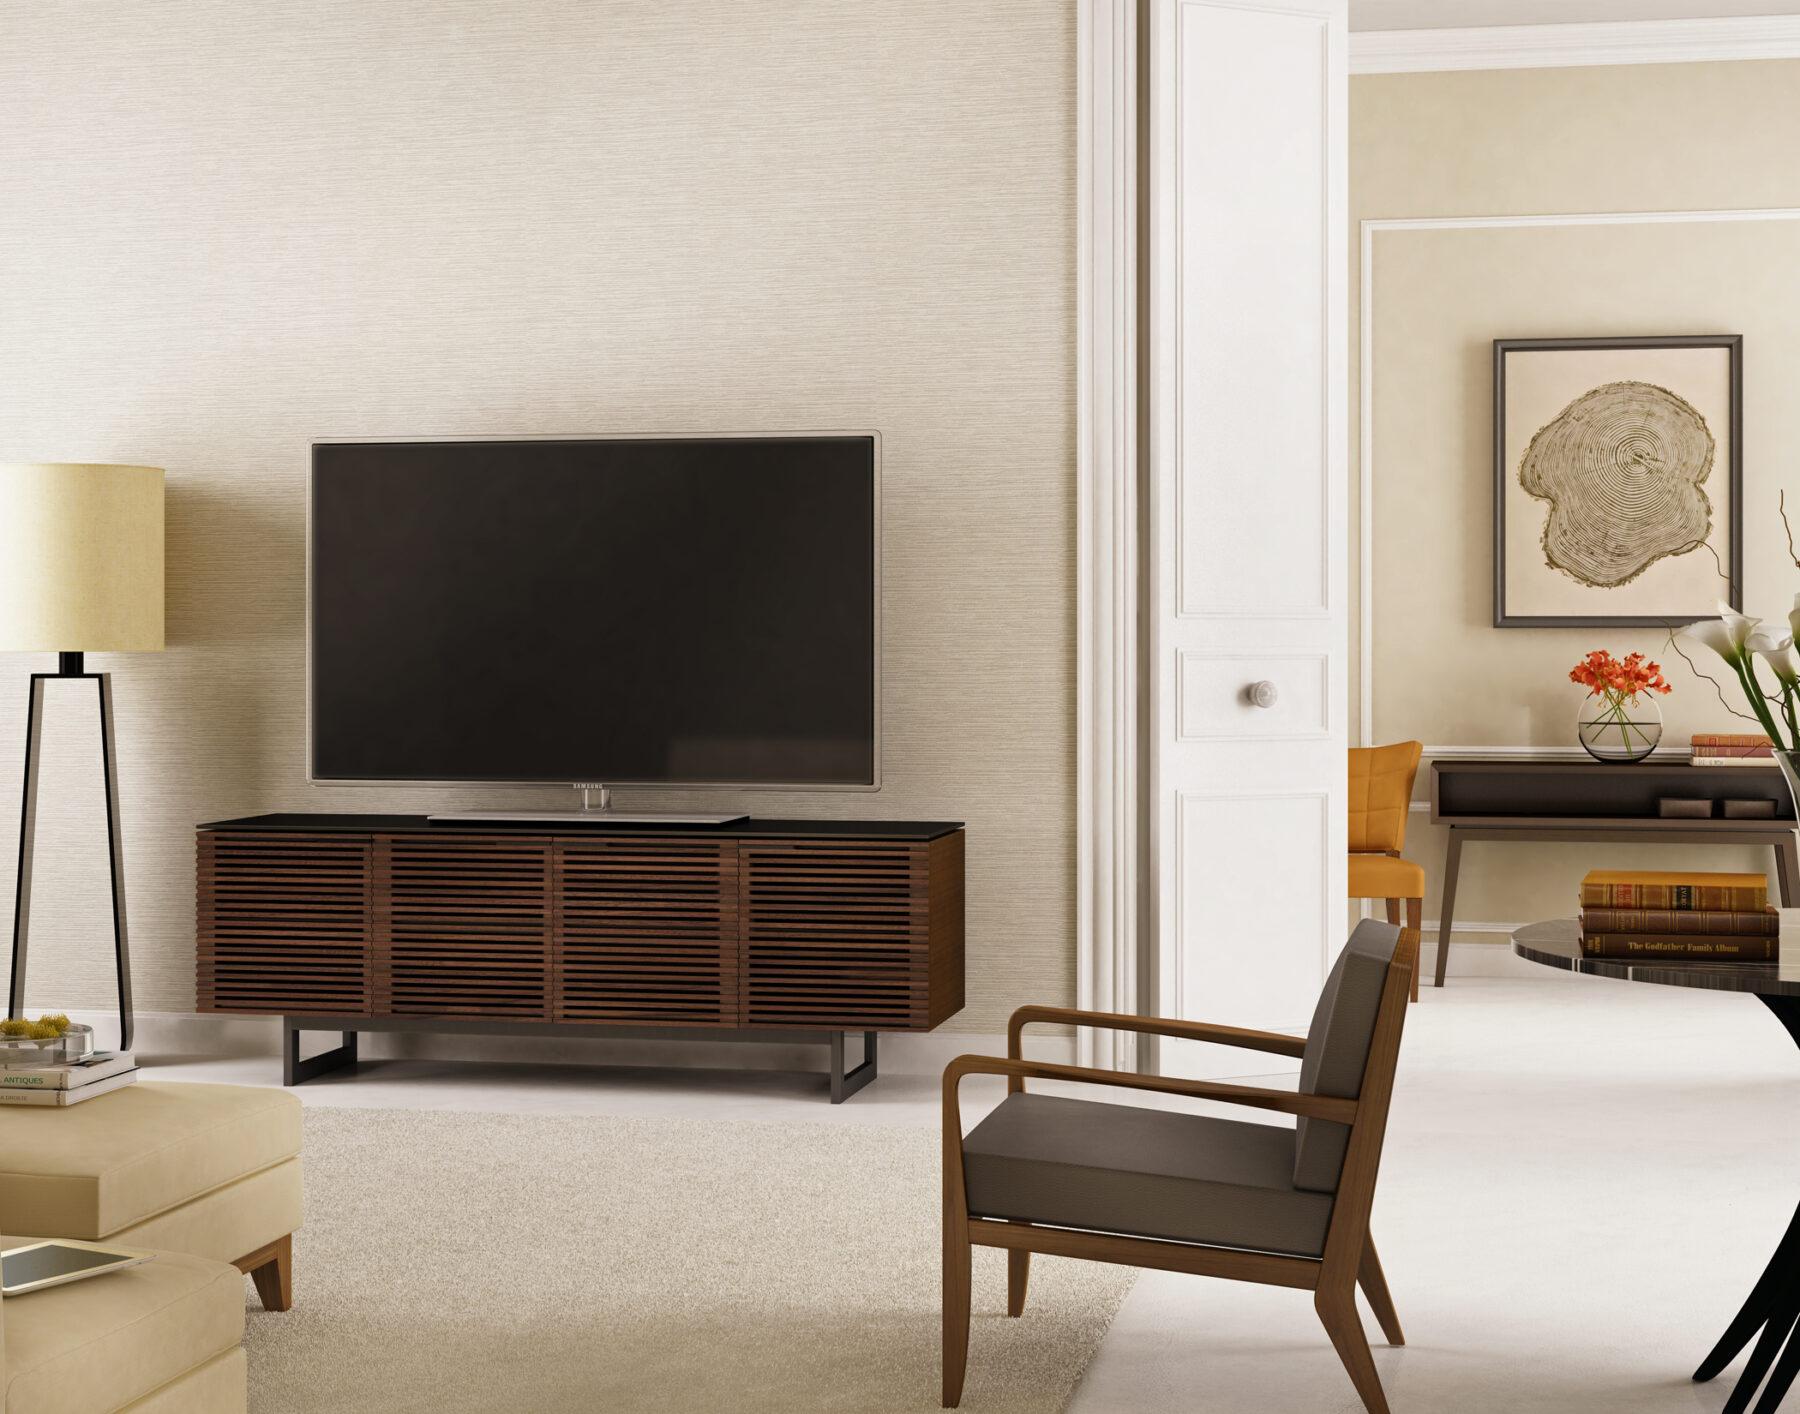 corridor-8179-bdi-chocolate-modern-tv-console-lifestyle-1